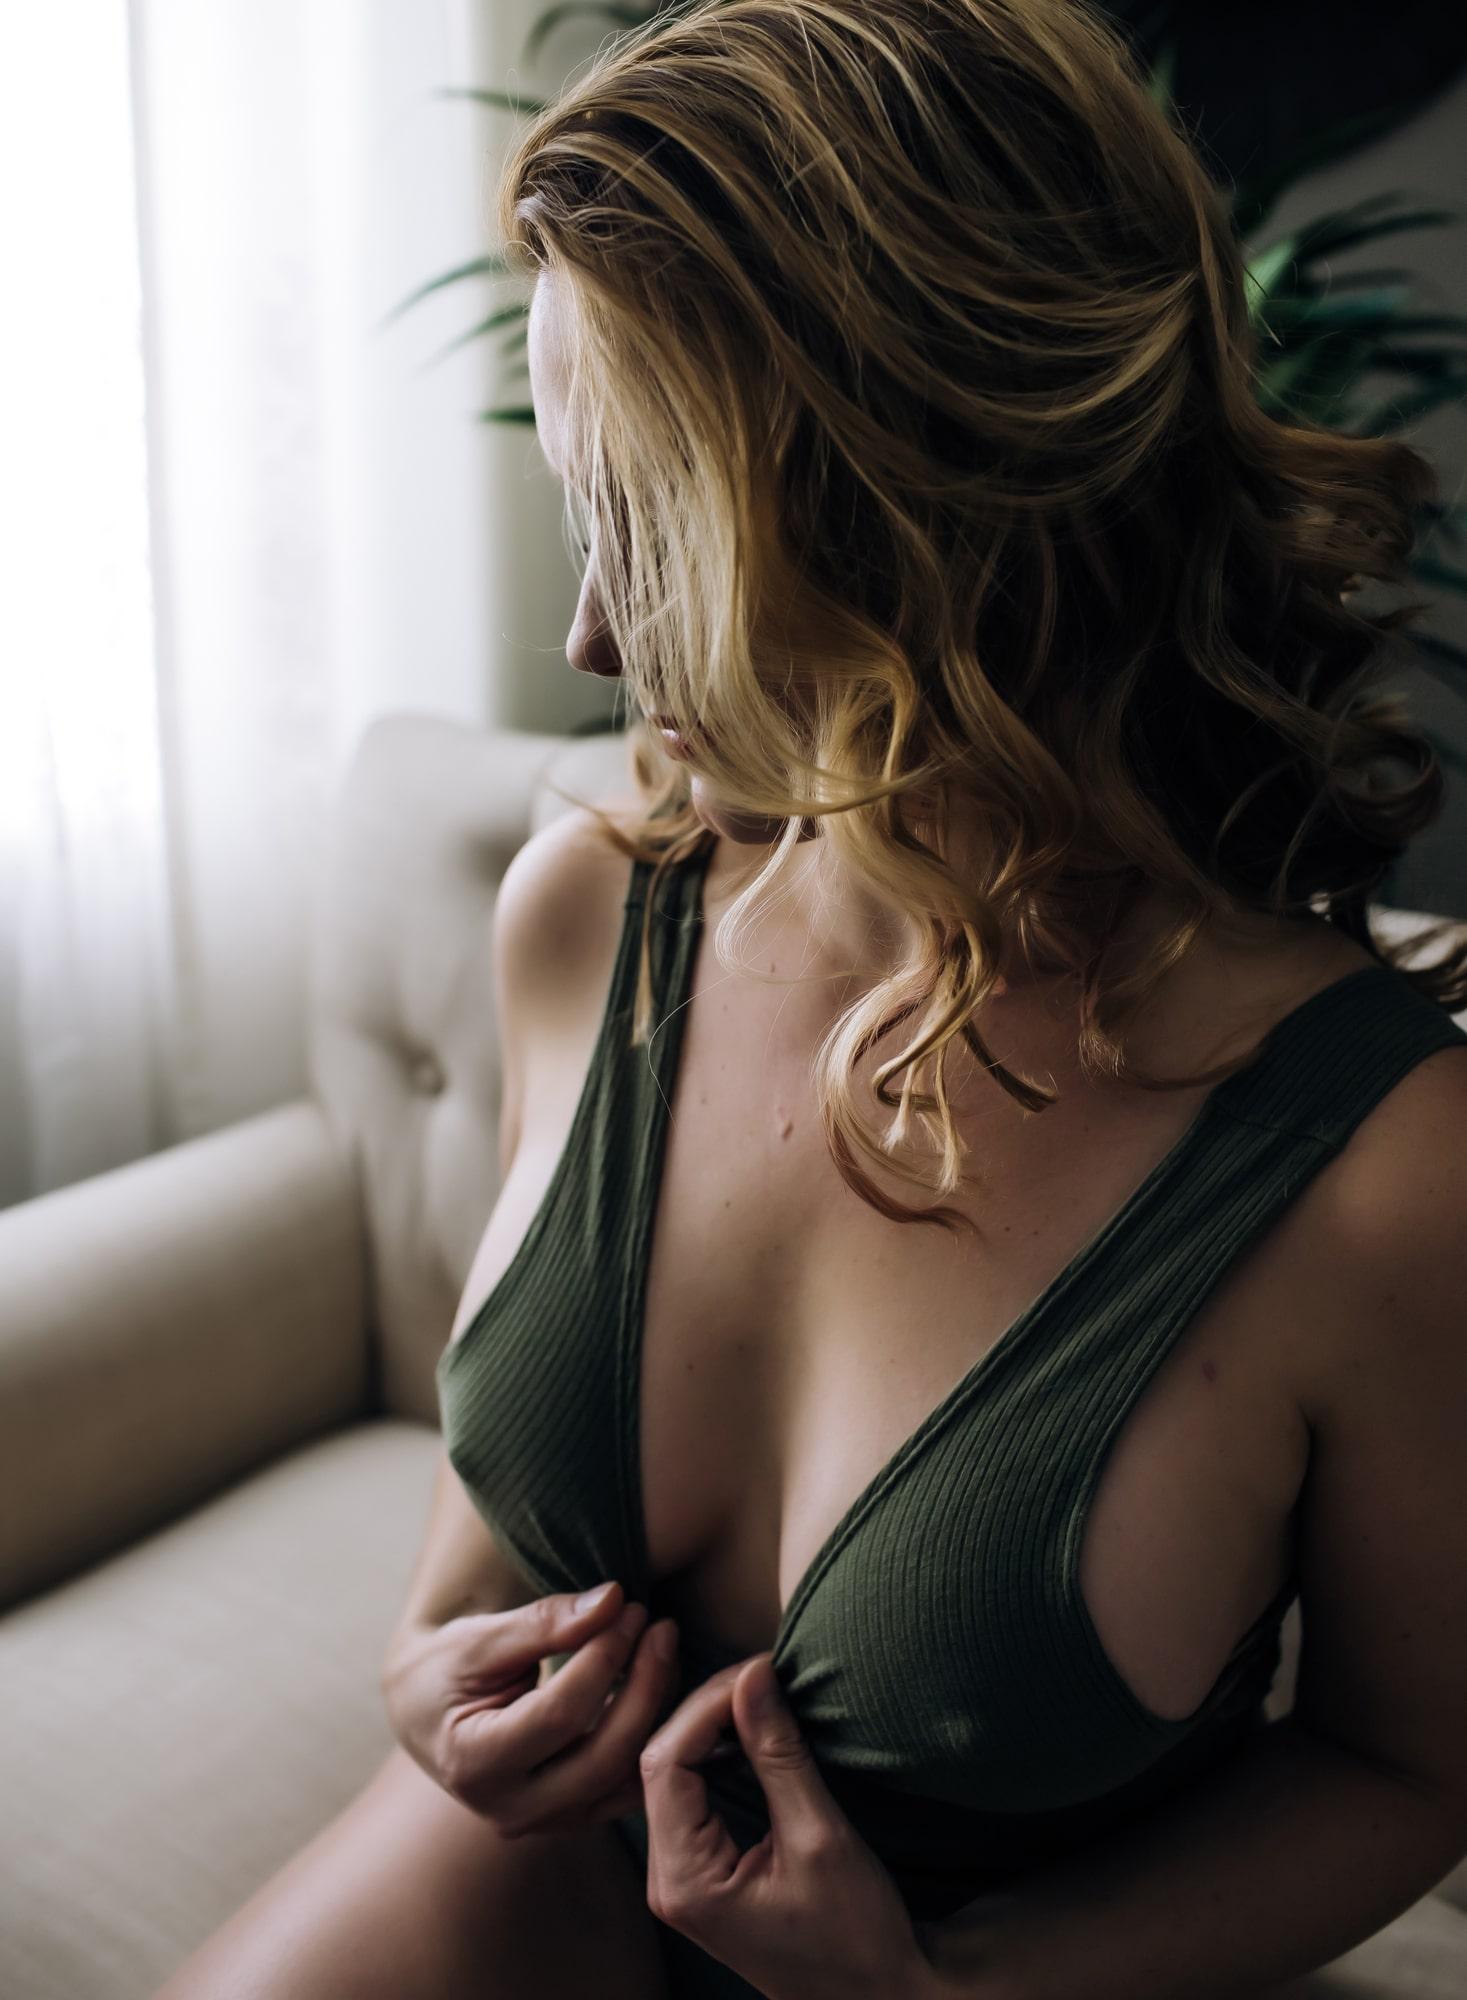 blonde-beauty-pulling-on-her-green-bodysuit